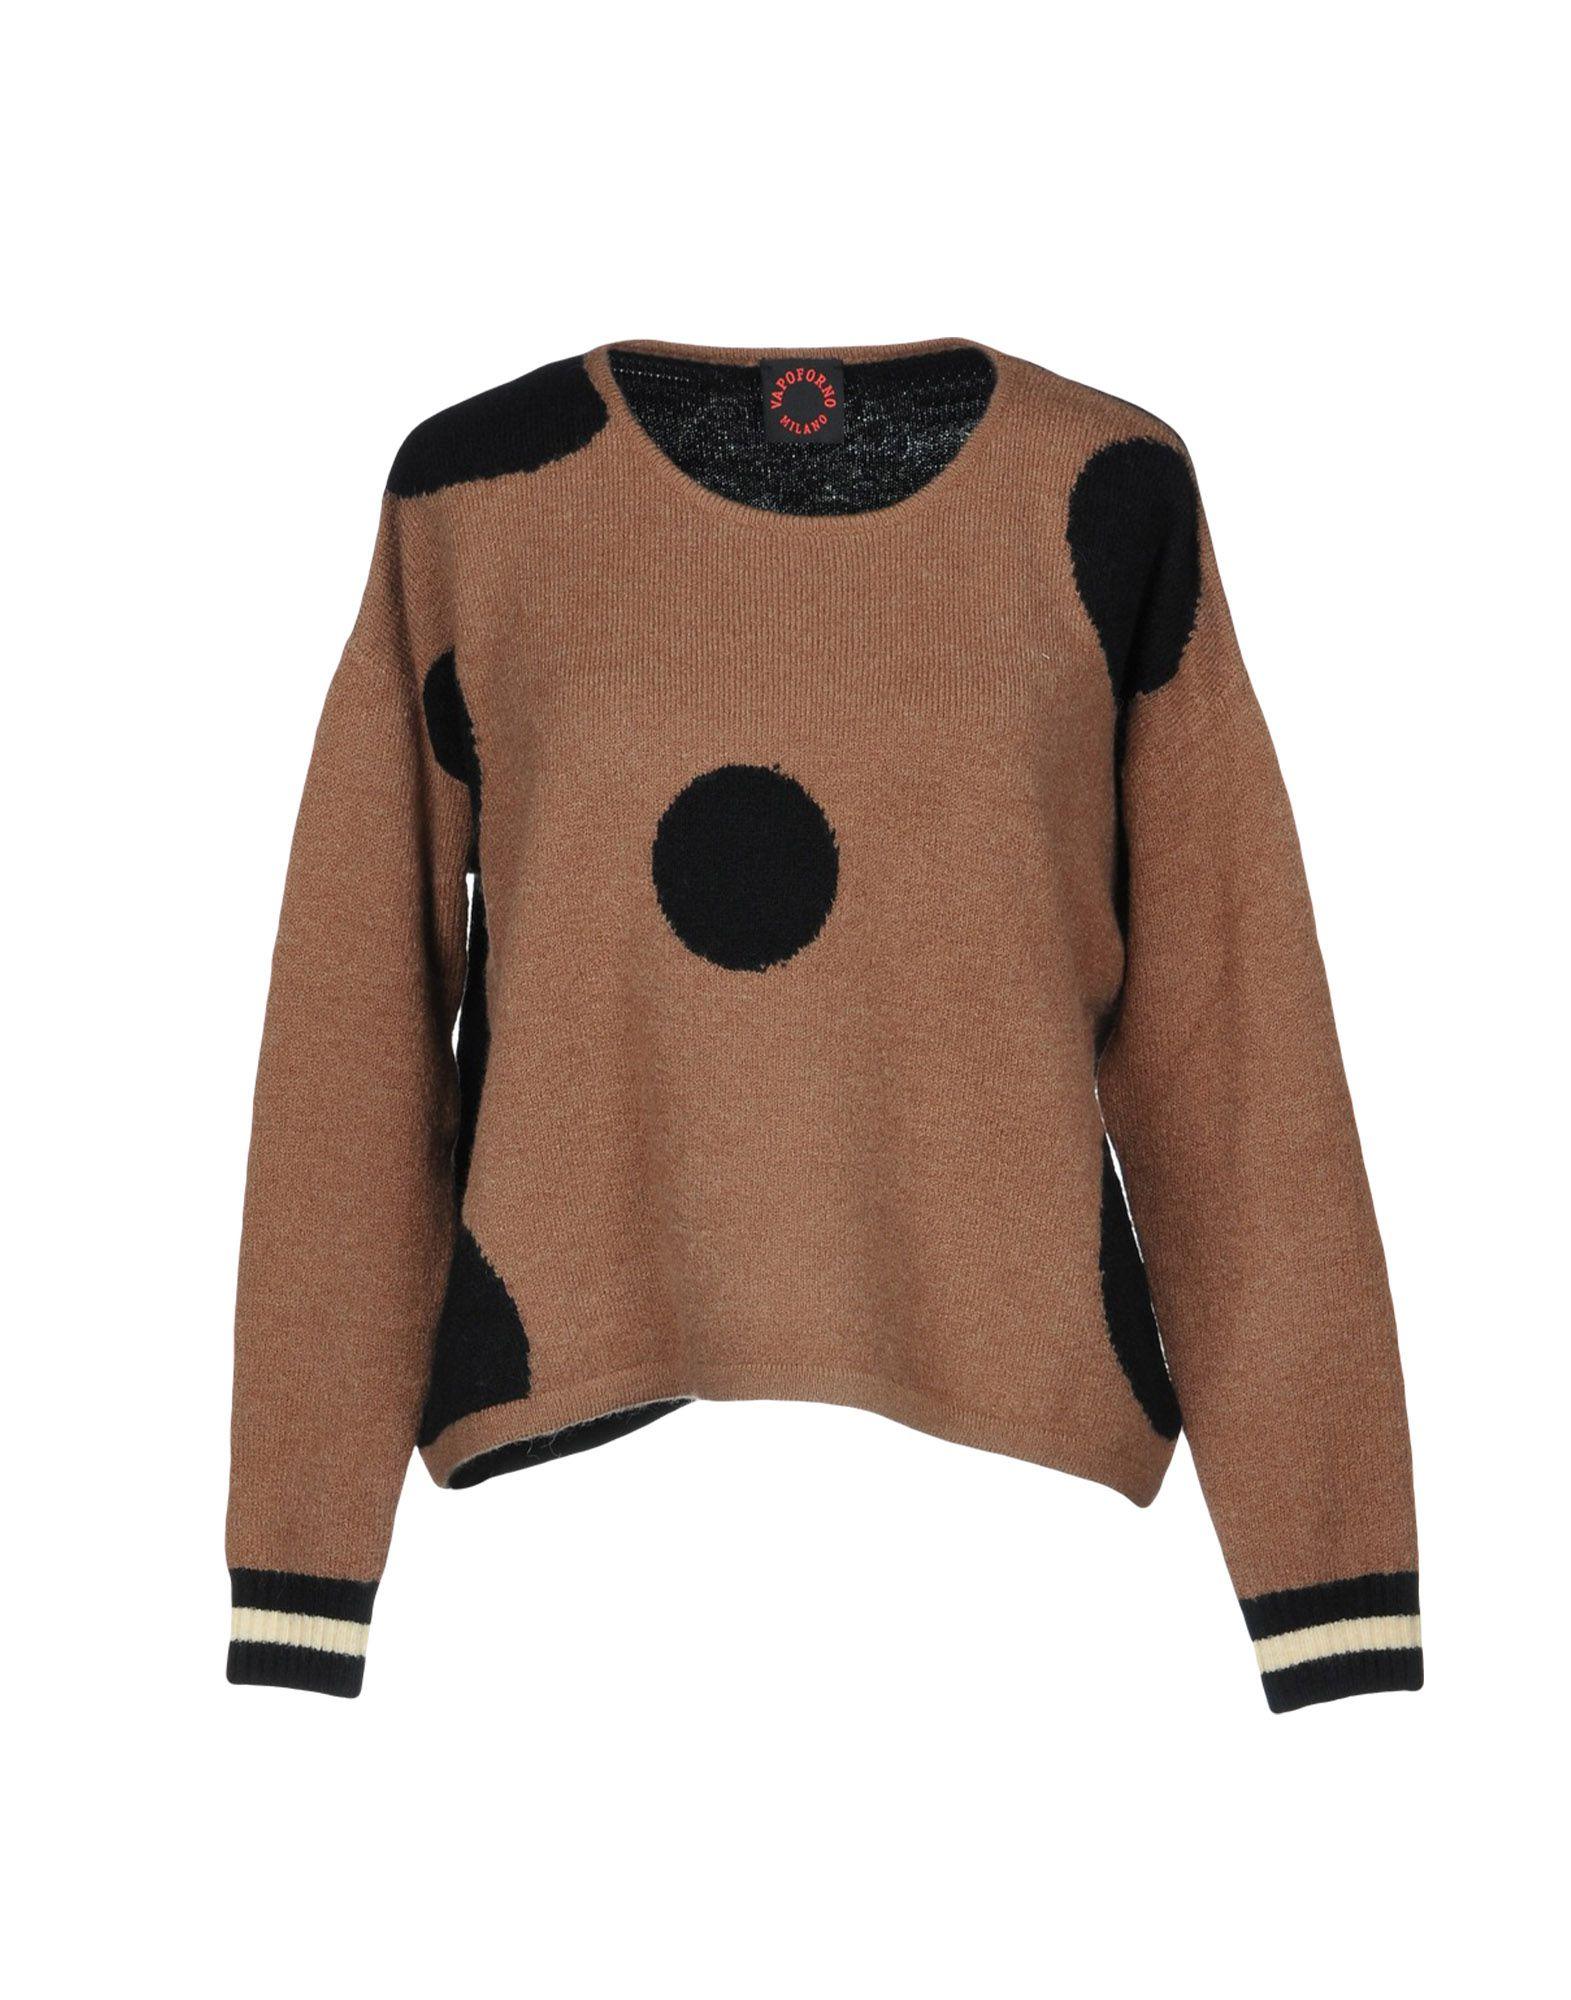 VAPOFORNO MILANO Свитер блуза xs milano блузы в горошек